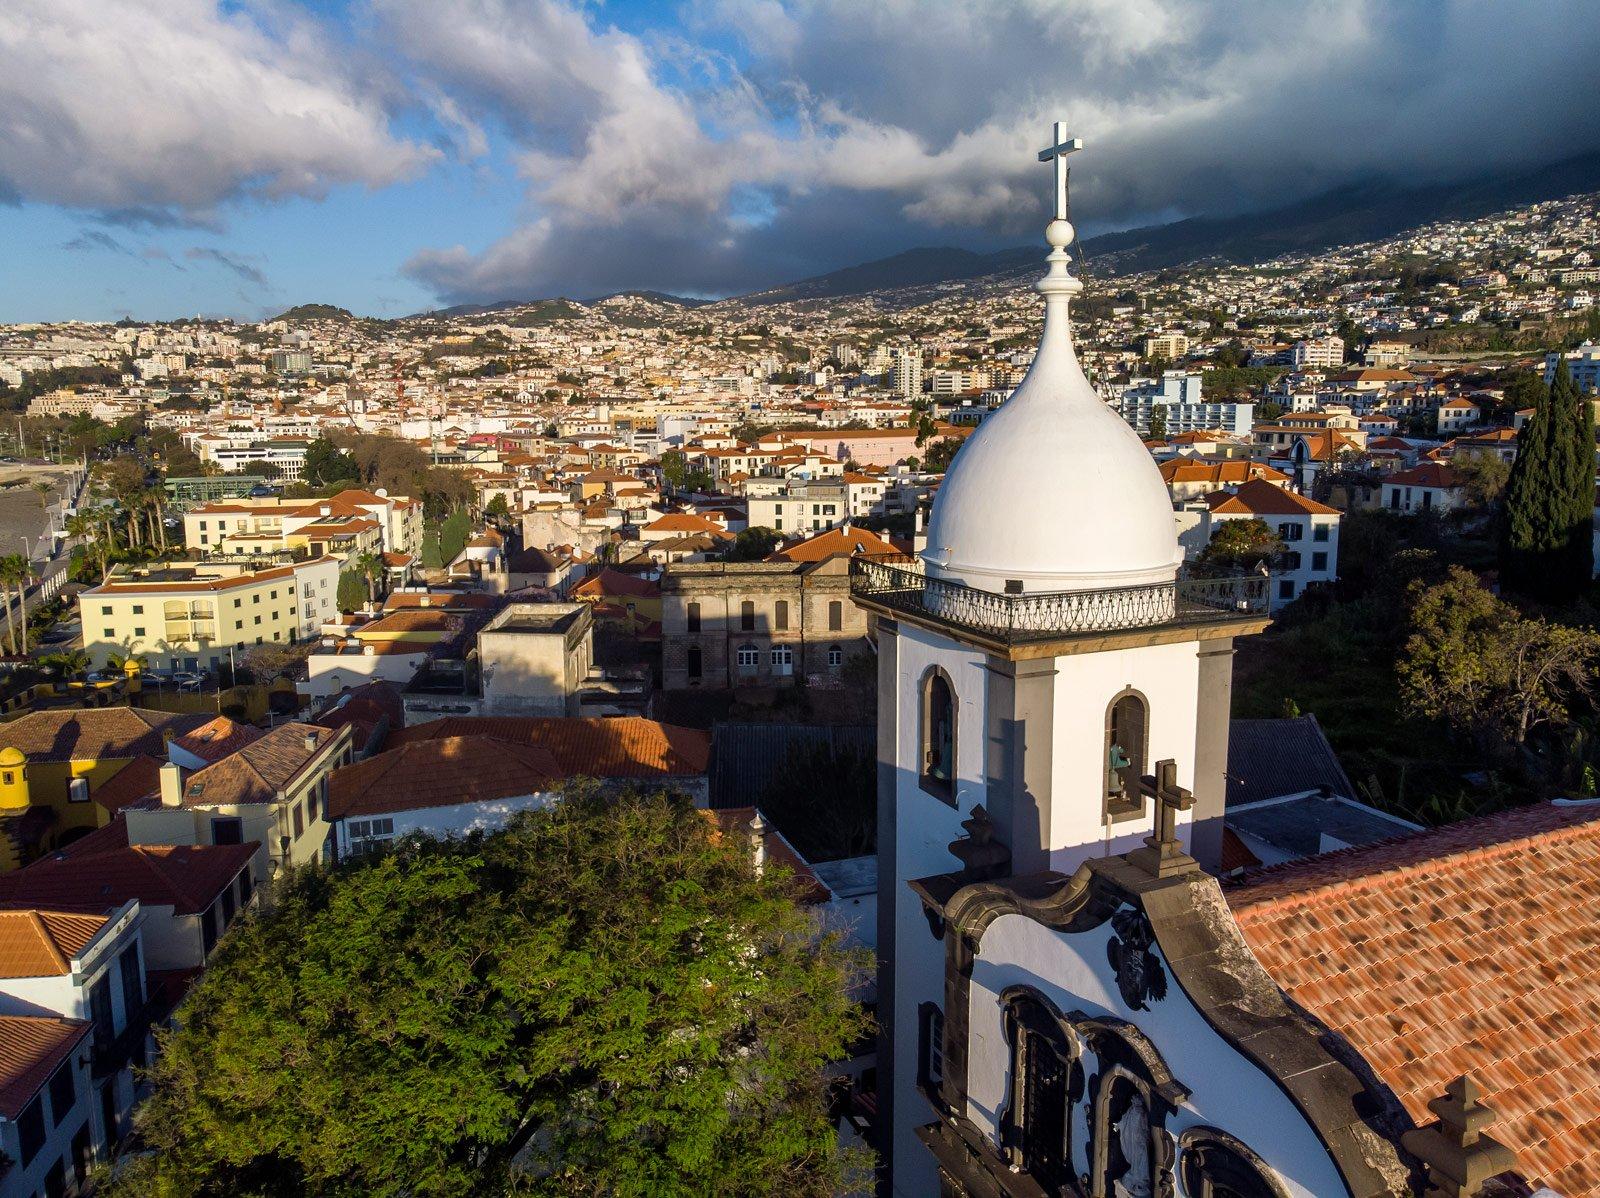 Poranek w Funchal